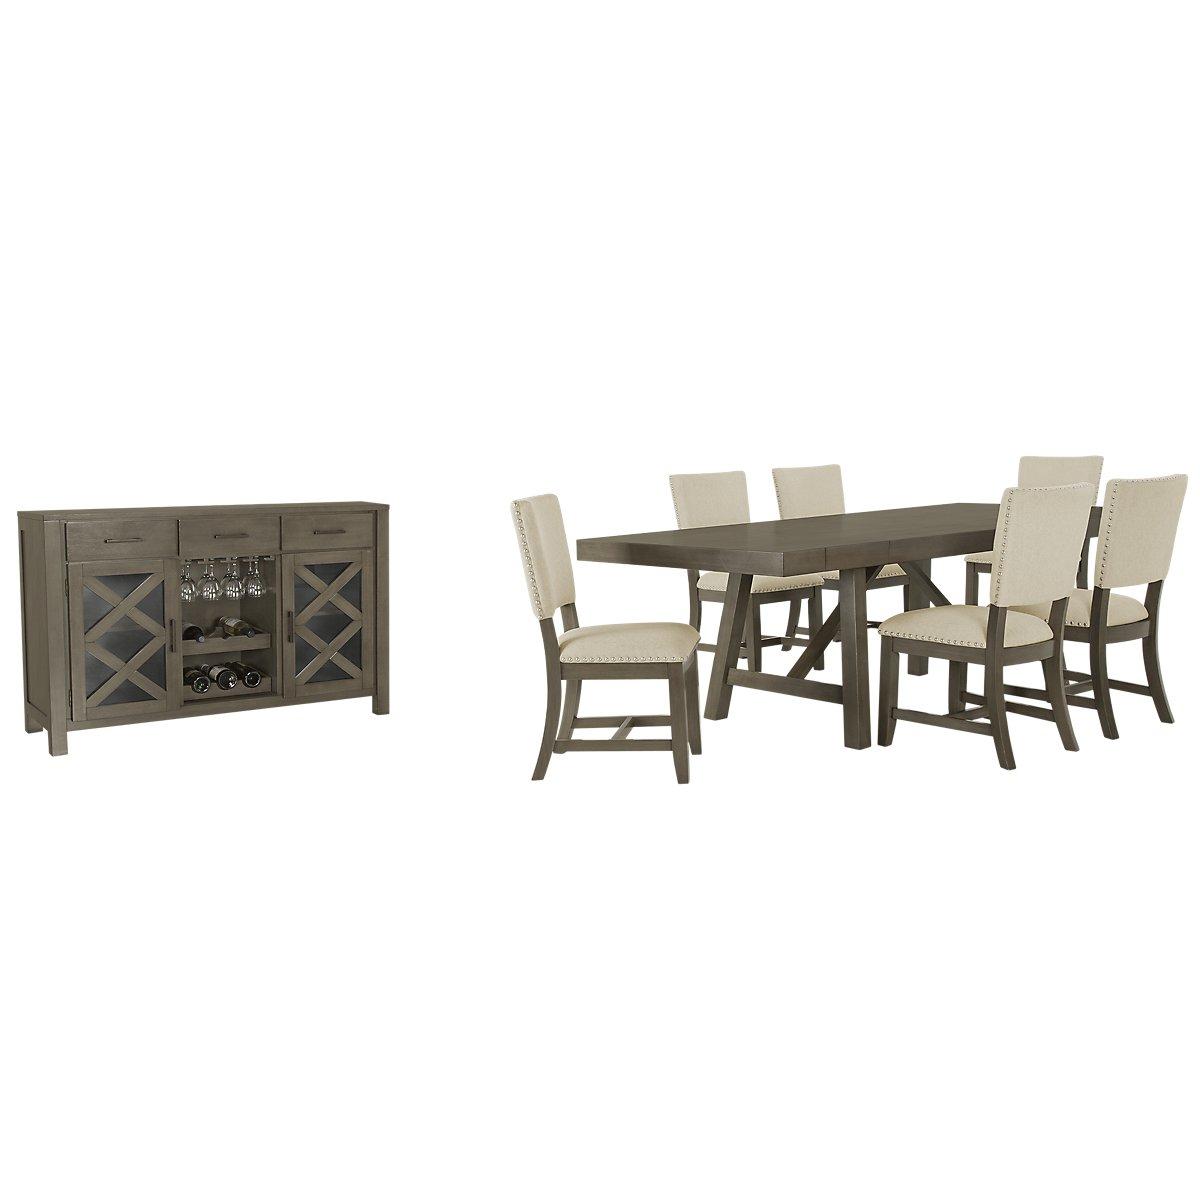 Photo Furniture Distributors Inc Images Paul Ferrante Iron Chandeliers Distributors